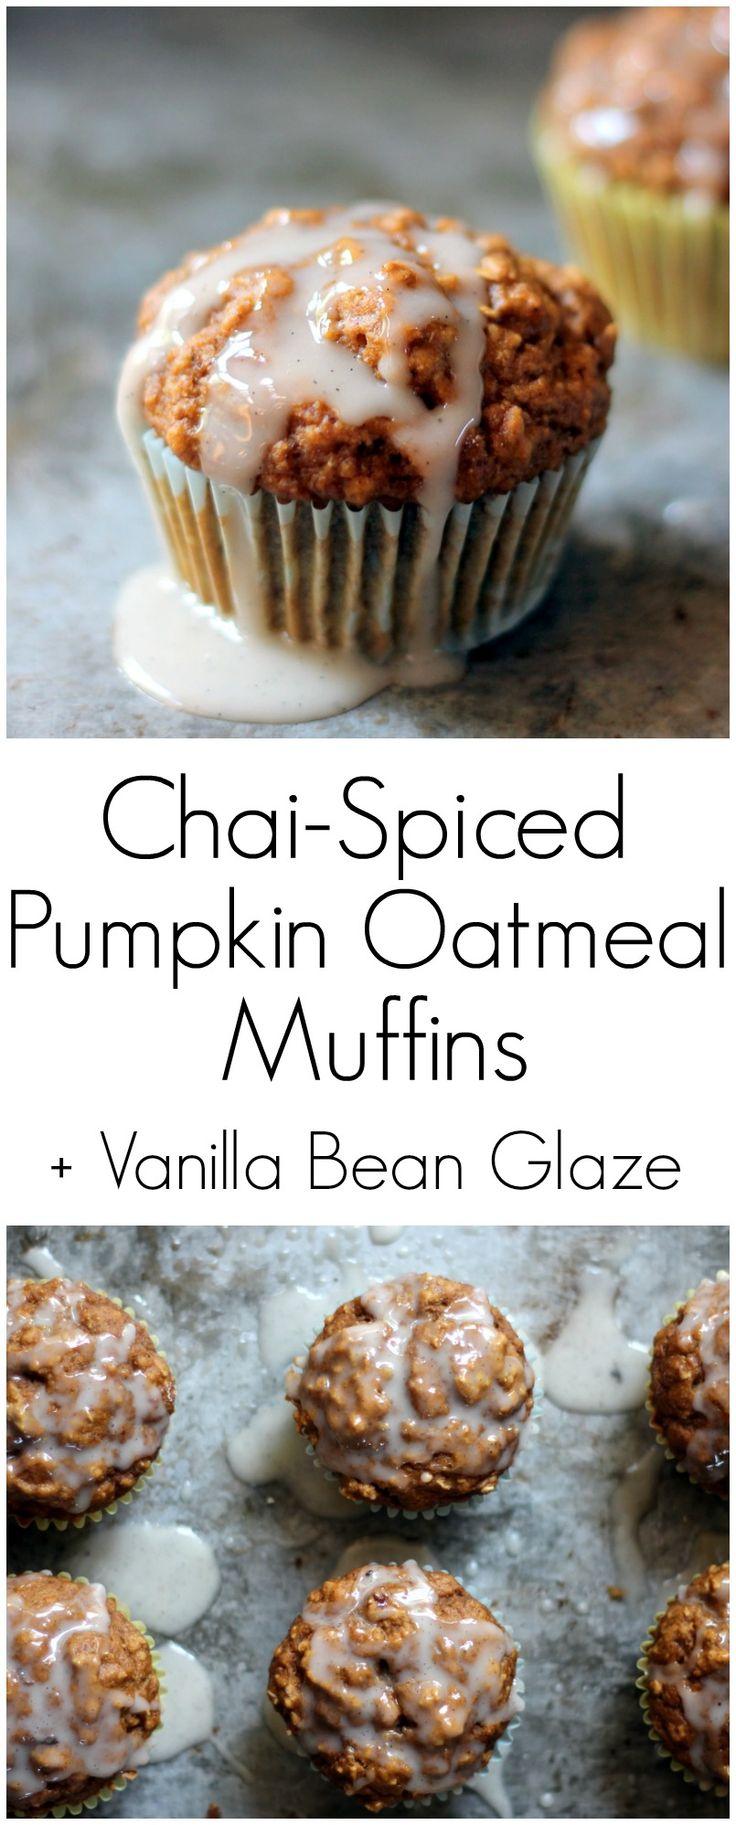 ... Pumpkin Oatmeal Muffins with a lovely cream cheese vanilla bean glaze